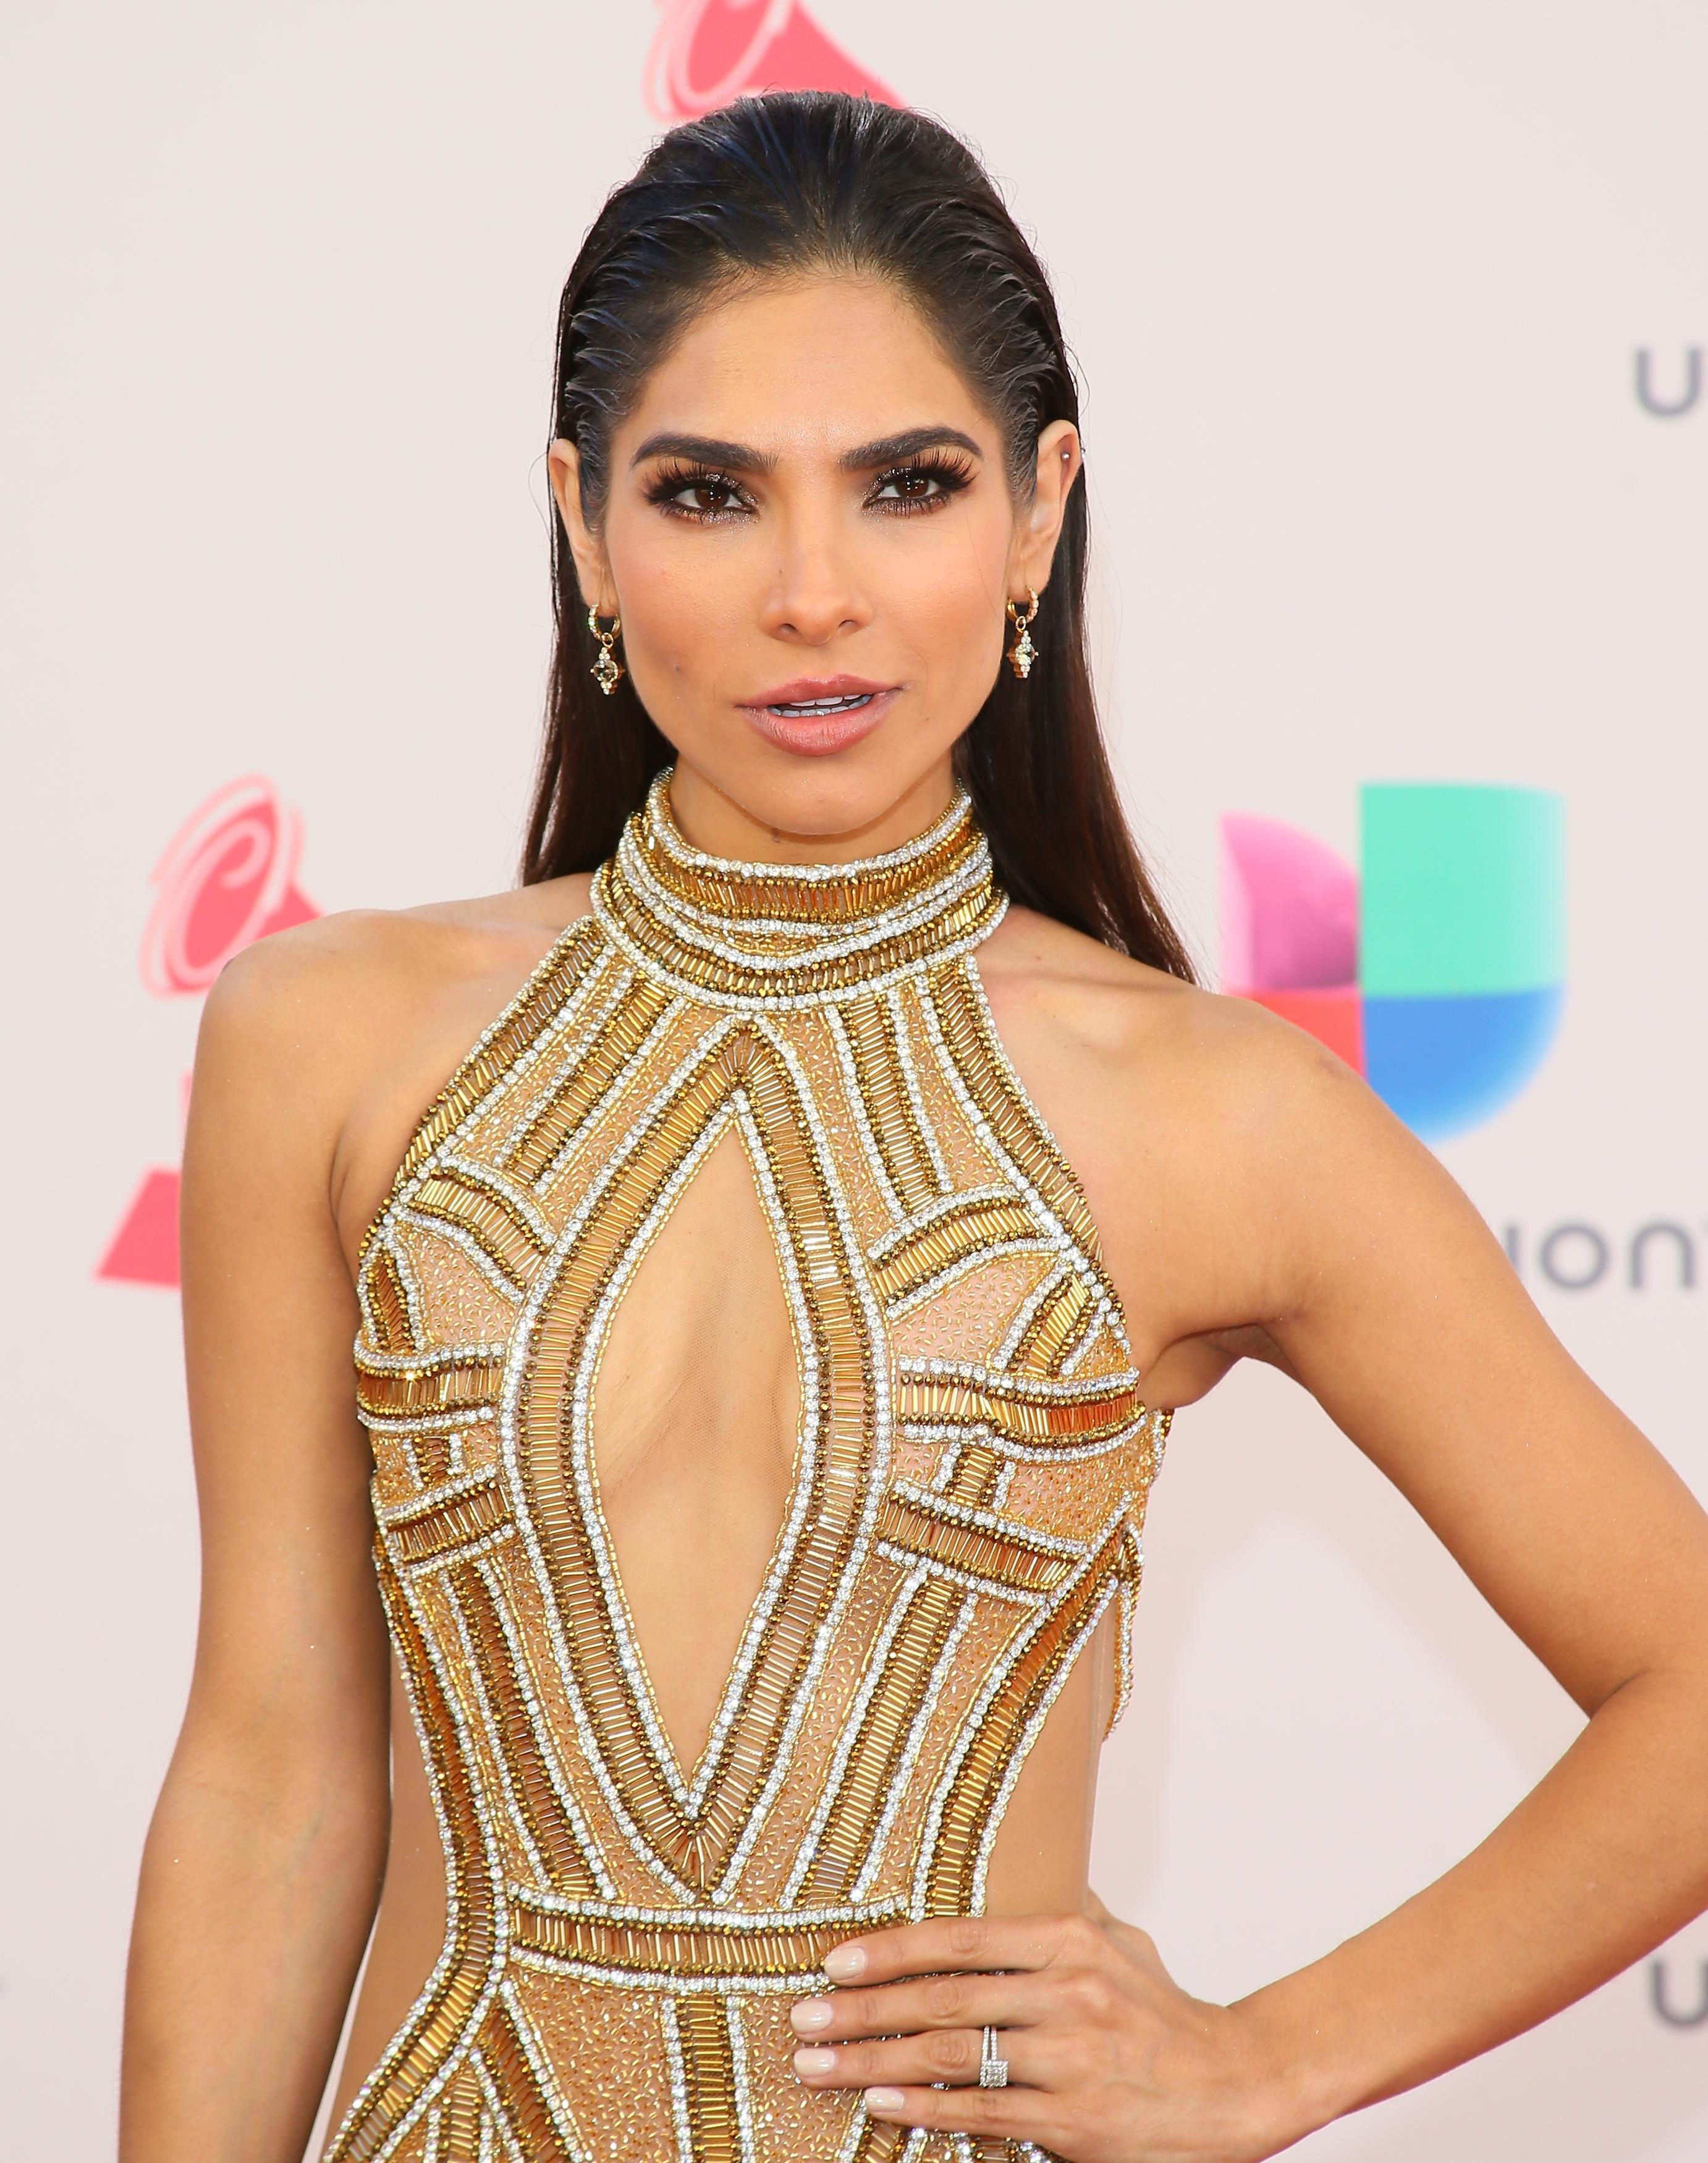 17th Annual Latin Grammy Awards - Arrivals